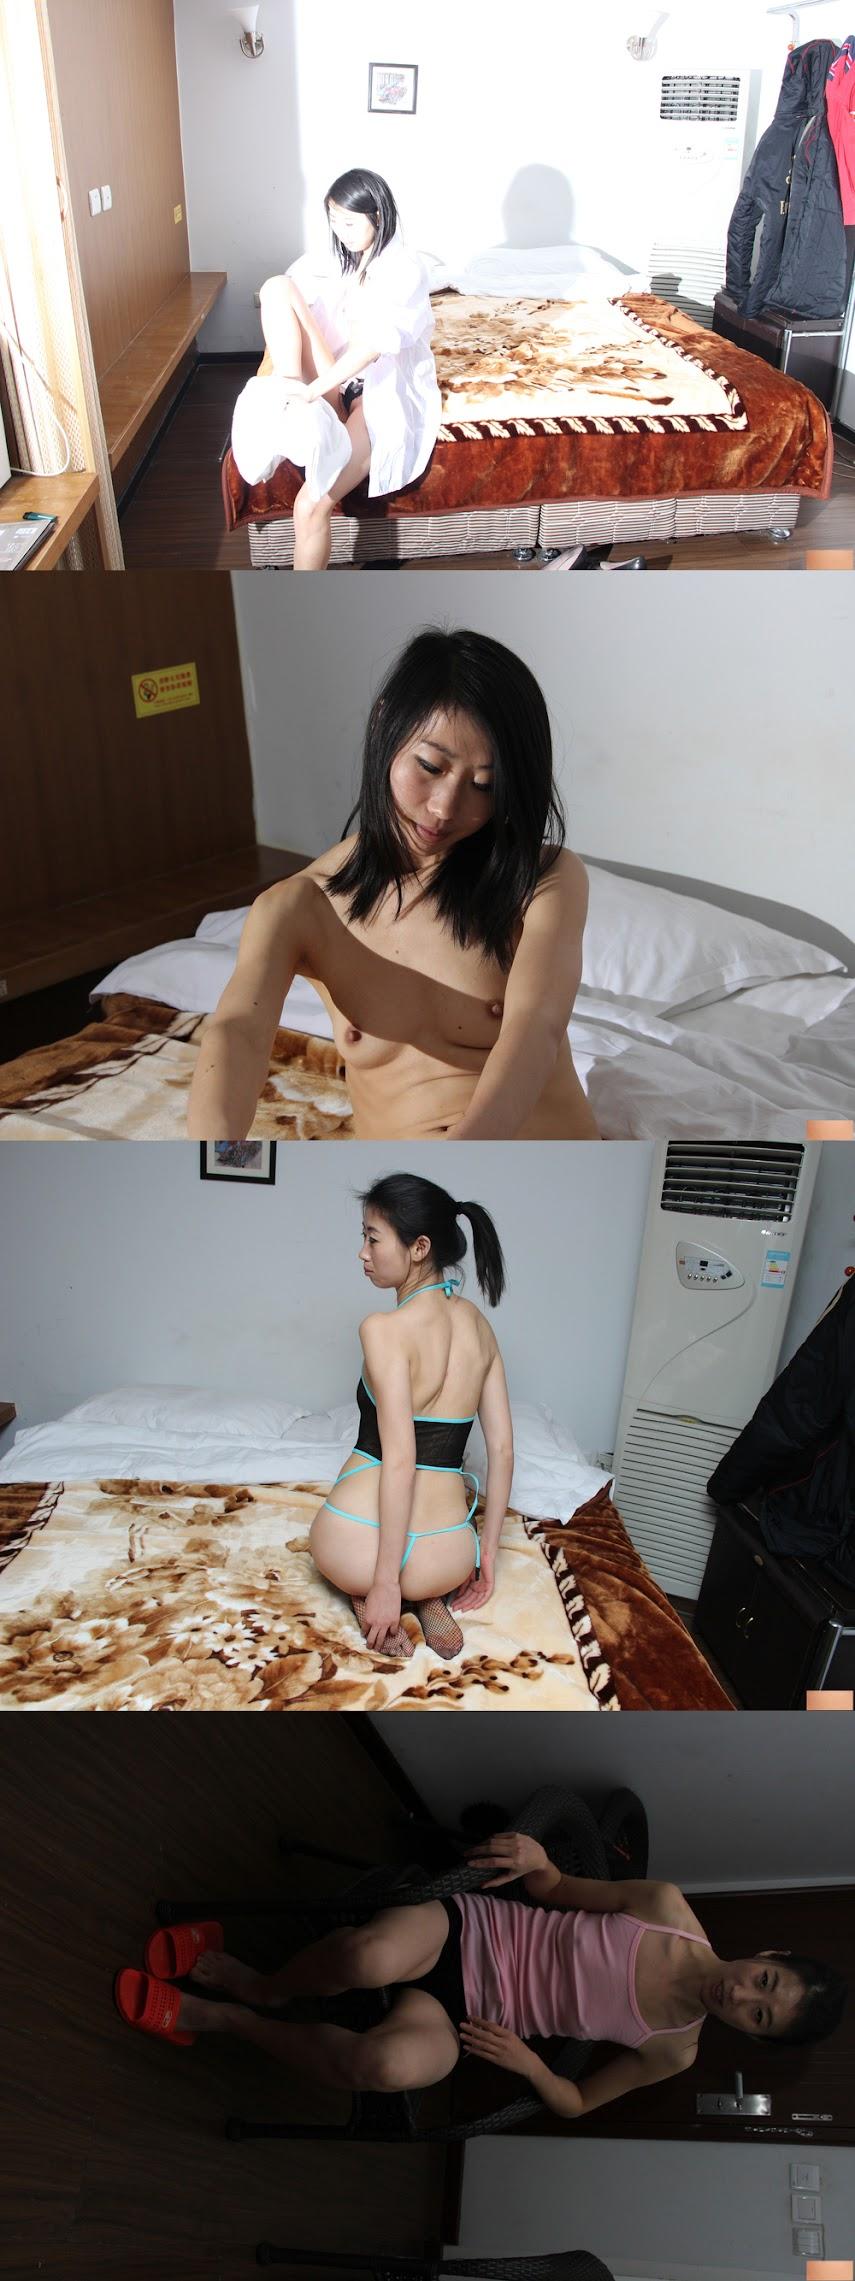 Asian 9038小晴2013.01.02(S).part04 - idols